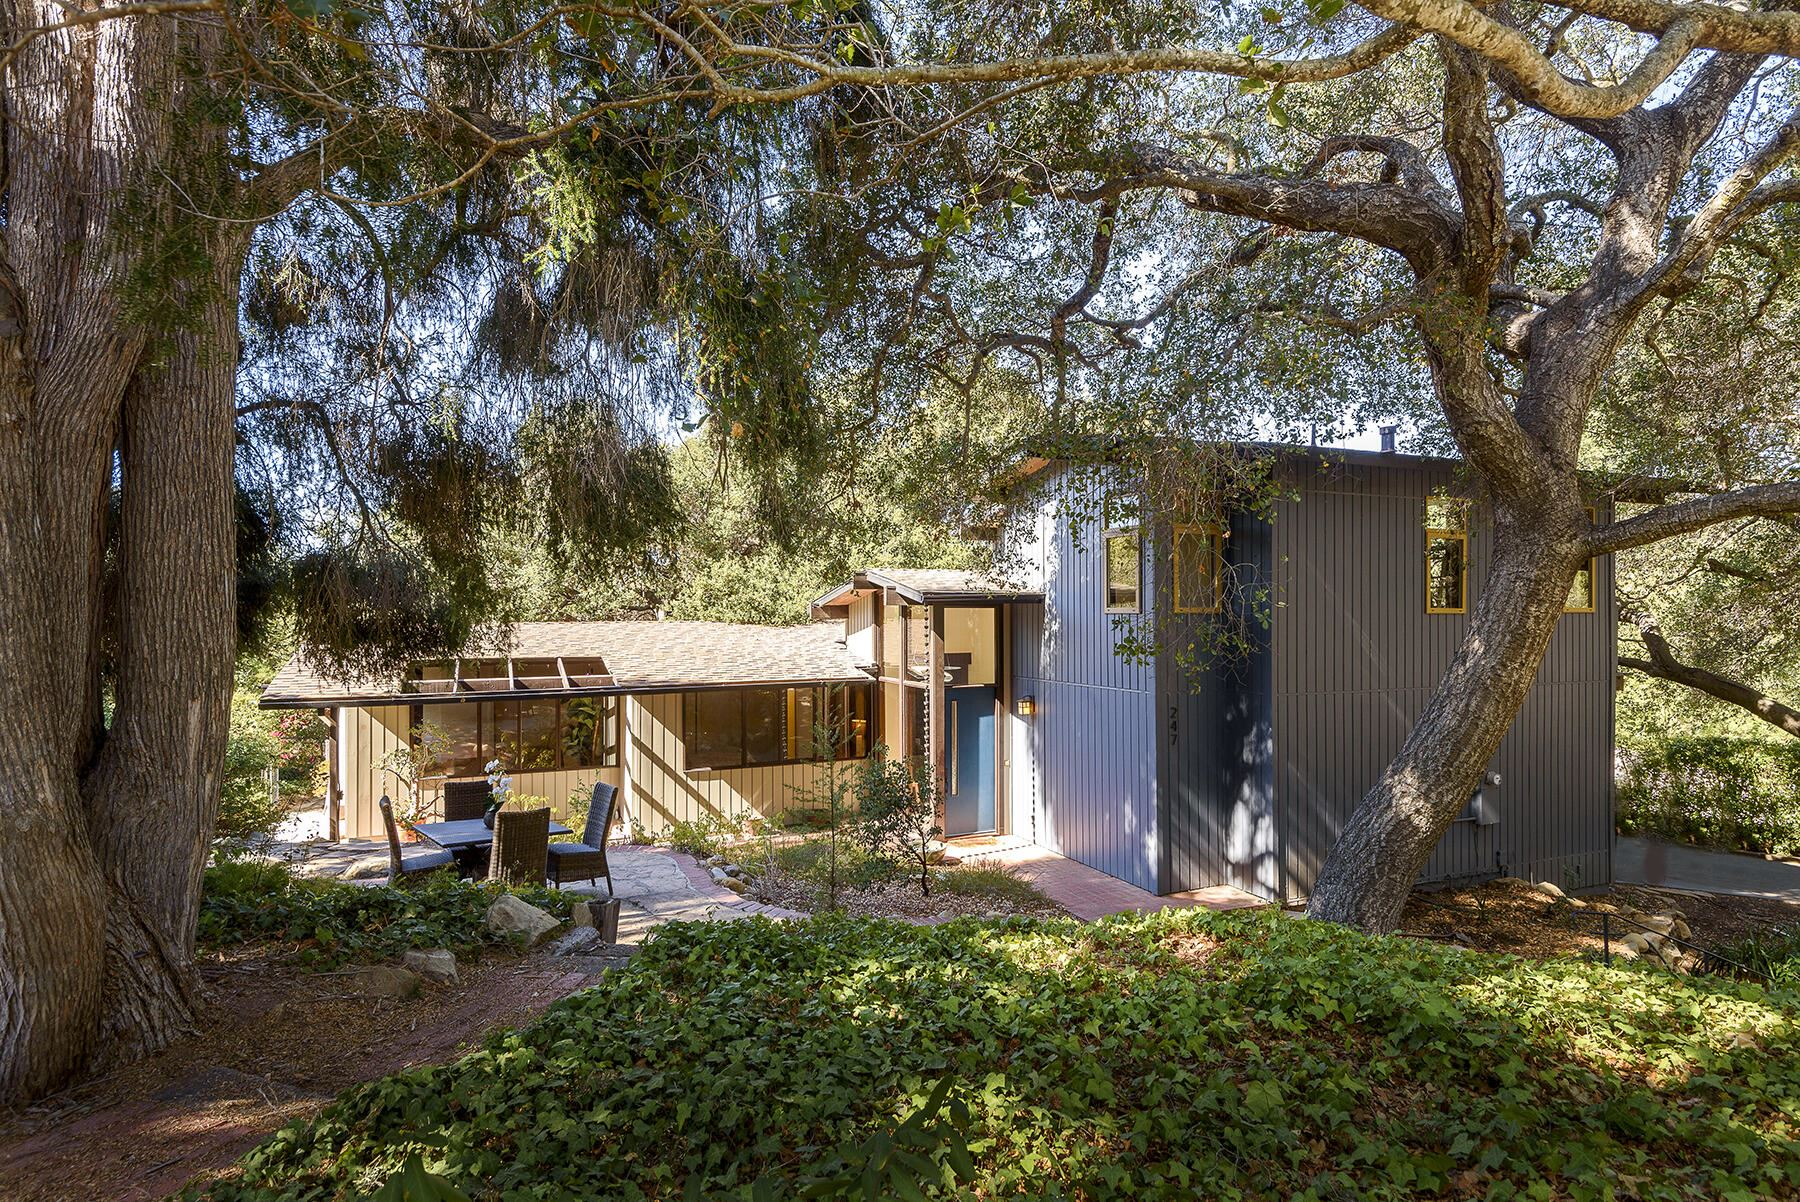 247 Canon Dr, Santa Barbara, CA 93105 - MLS#: 21-3884